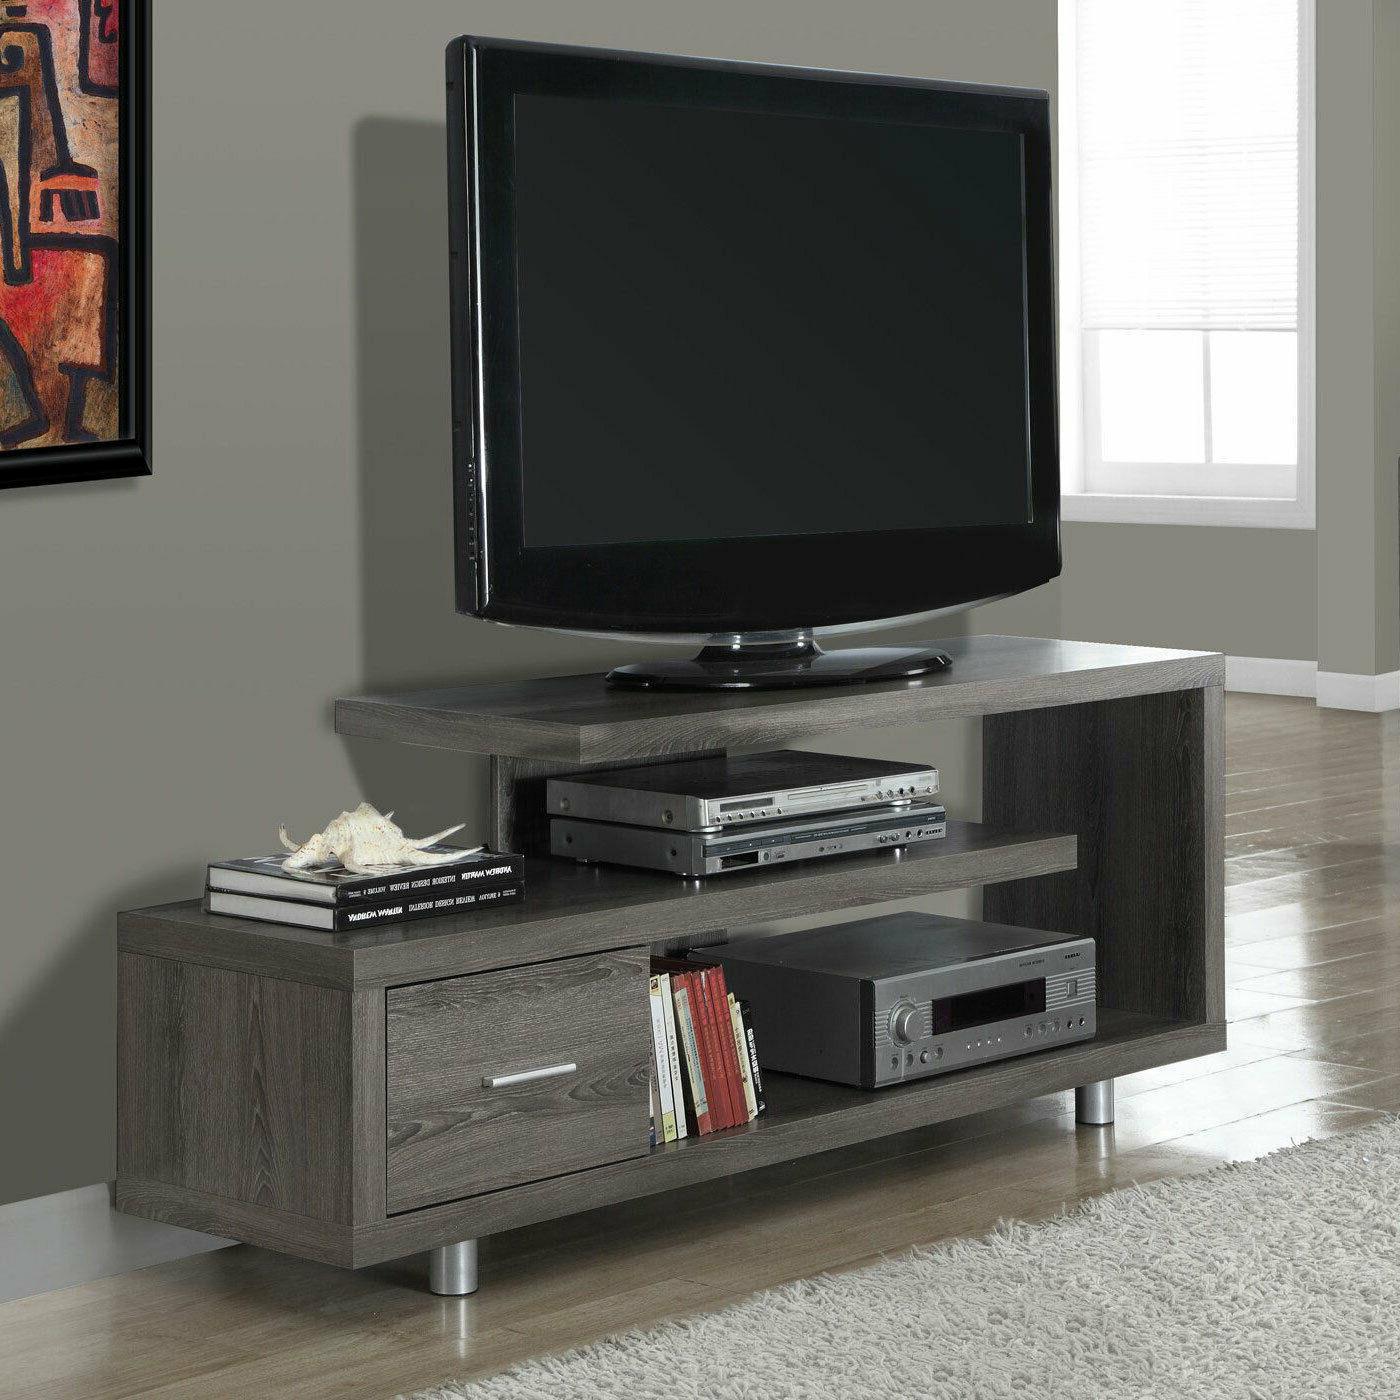 stylish 60 inch modern art deco tv